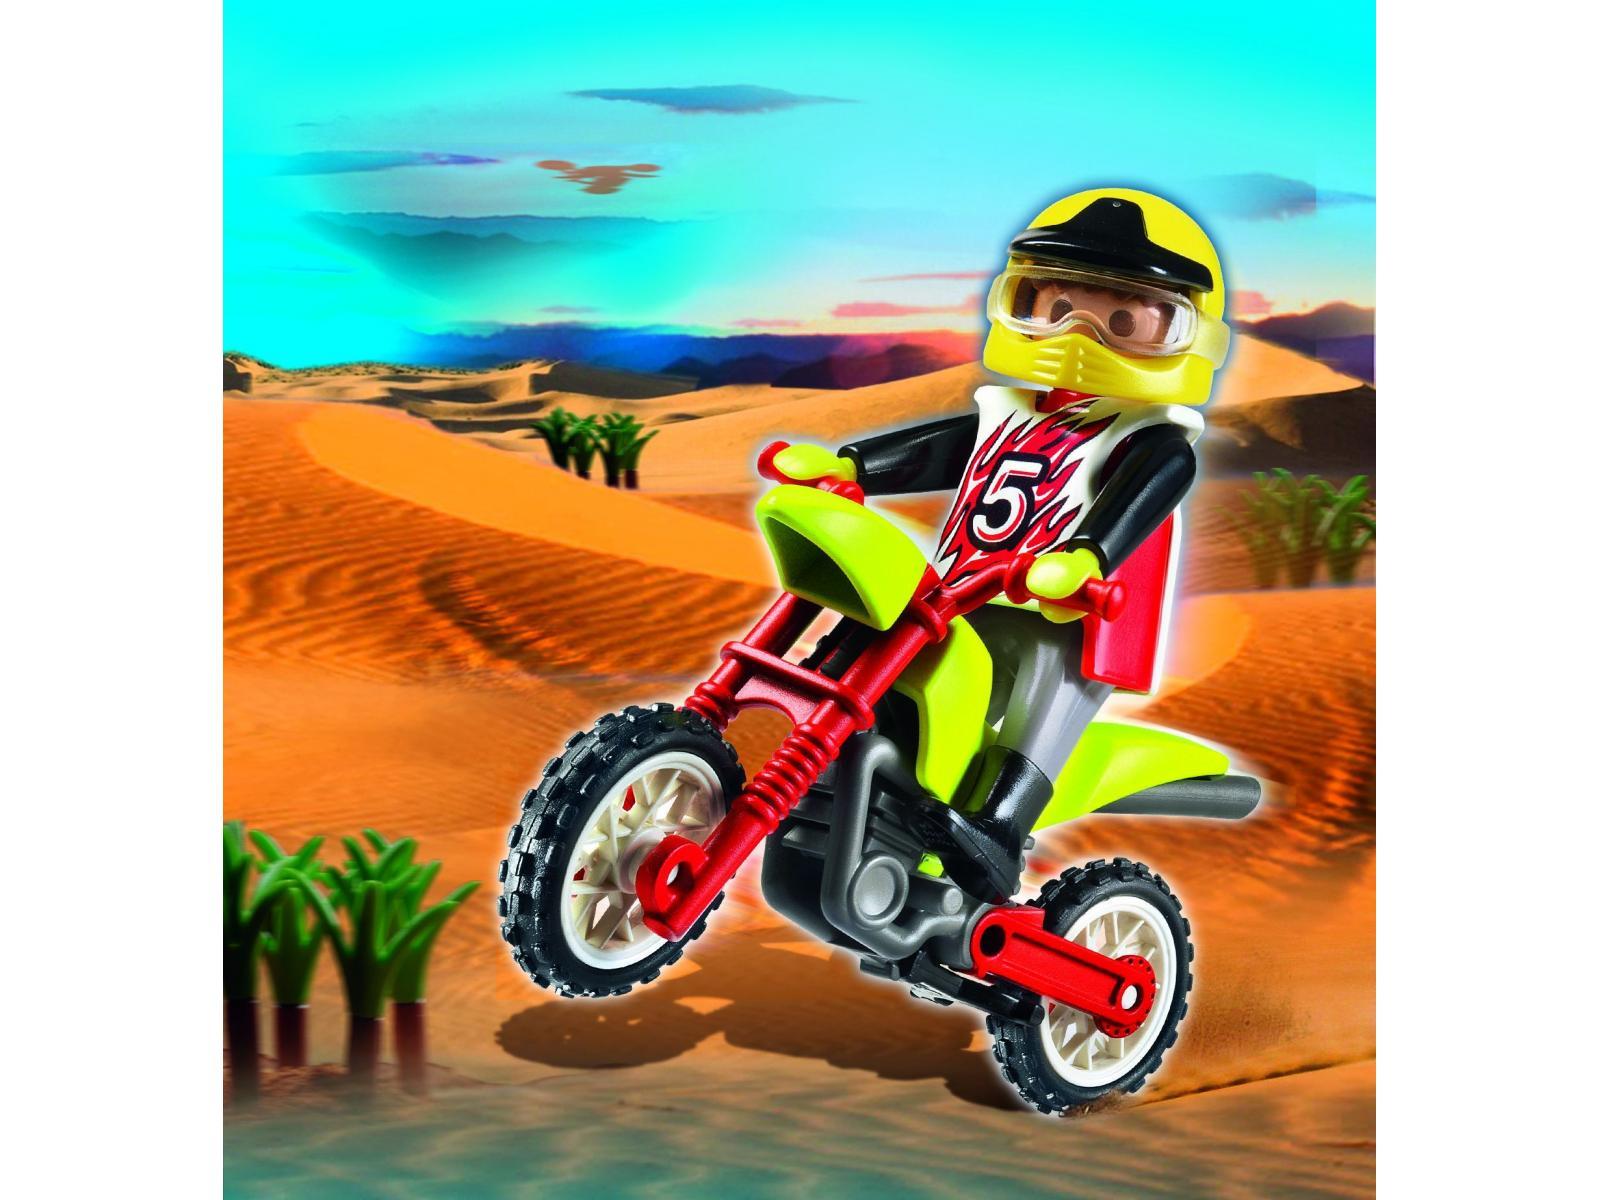 Playmobil oeuf 2010 pilote et moto cross 4923 - Moto cross playmobil ...